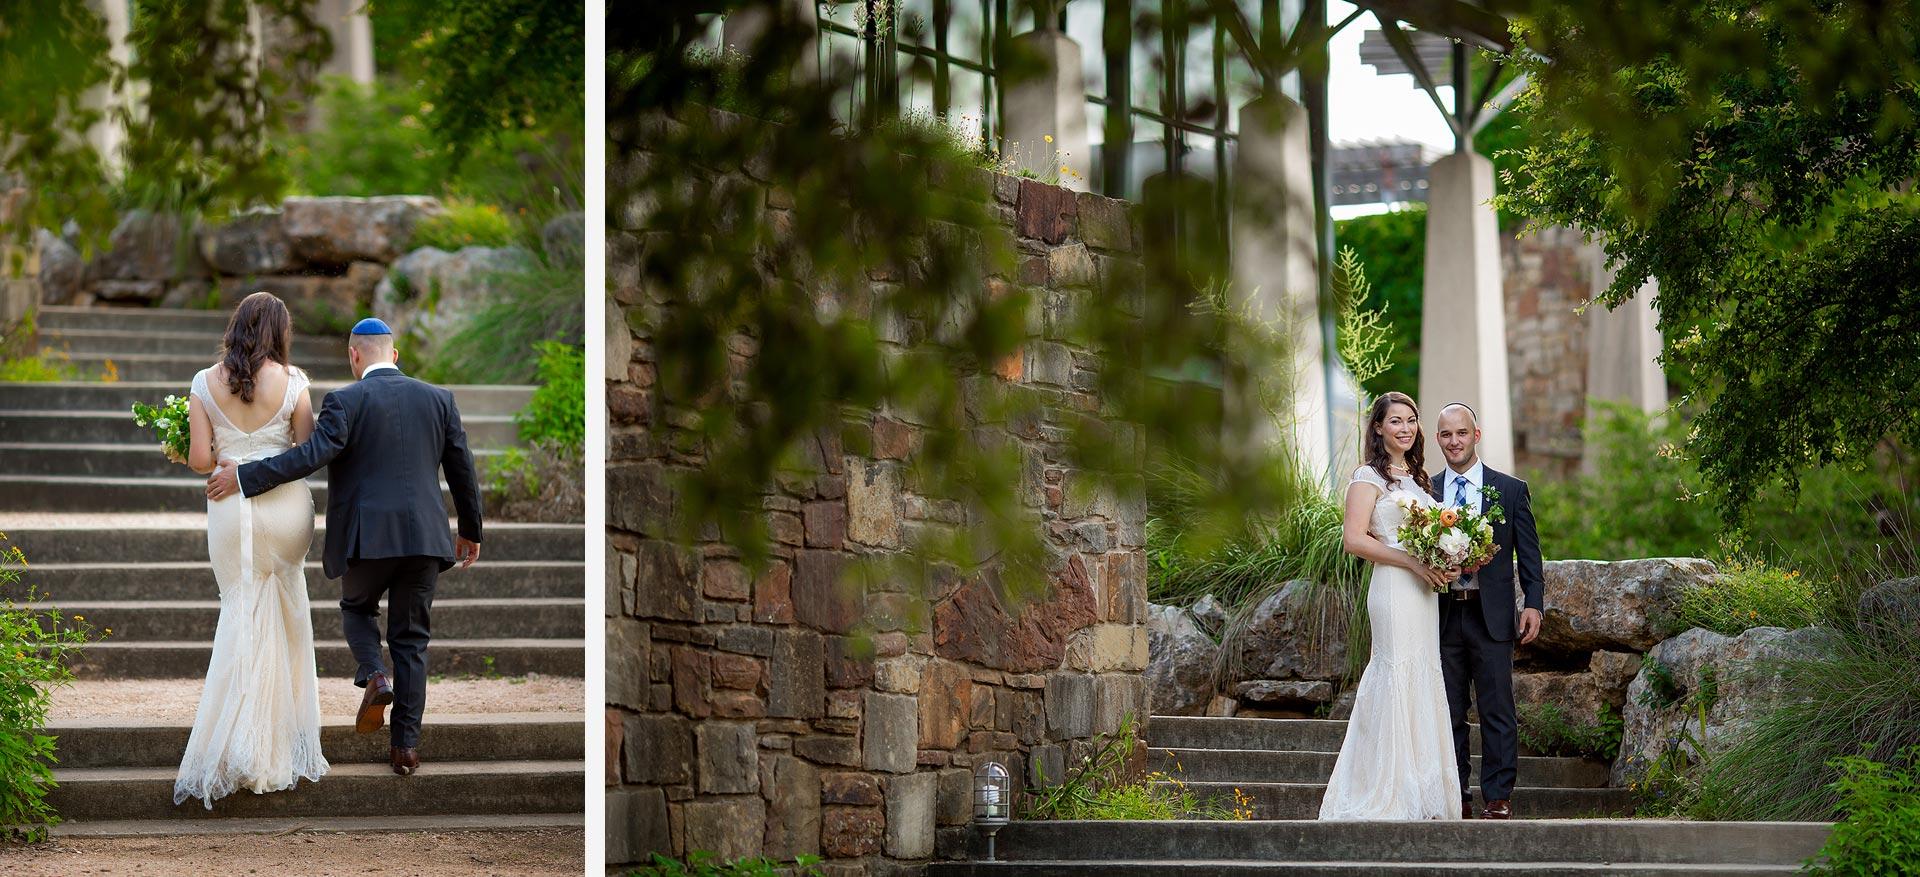 Best Texas Wedding Photographers